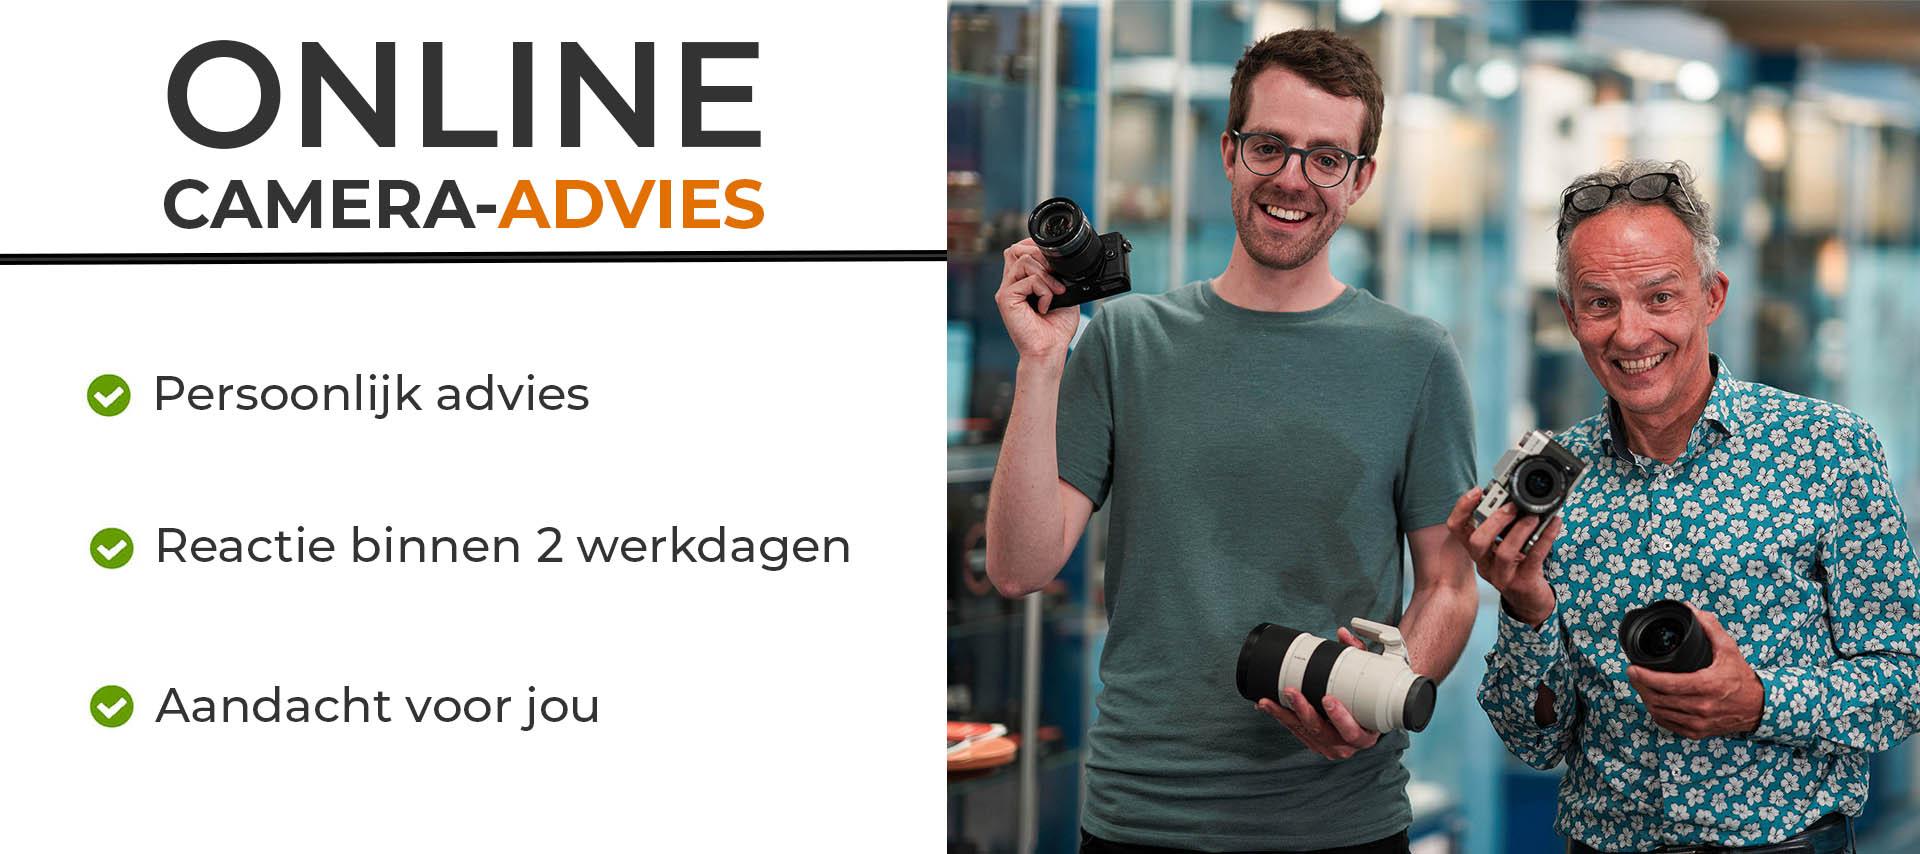 Foto Verweij Camera advies